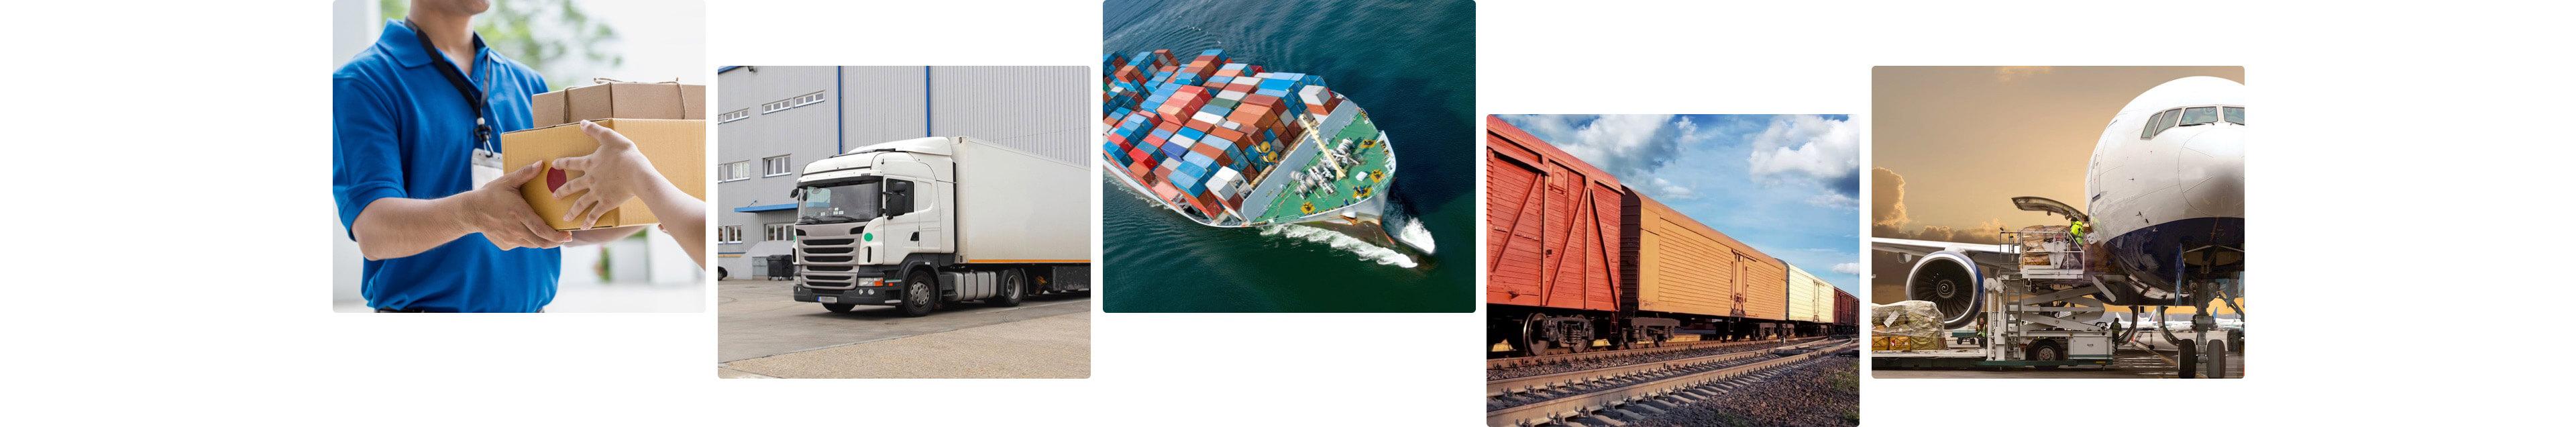 Transportation, logistics and supply chain management